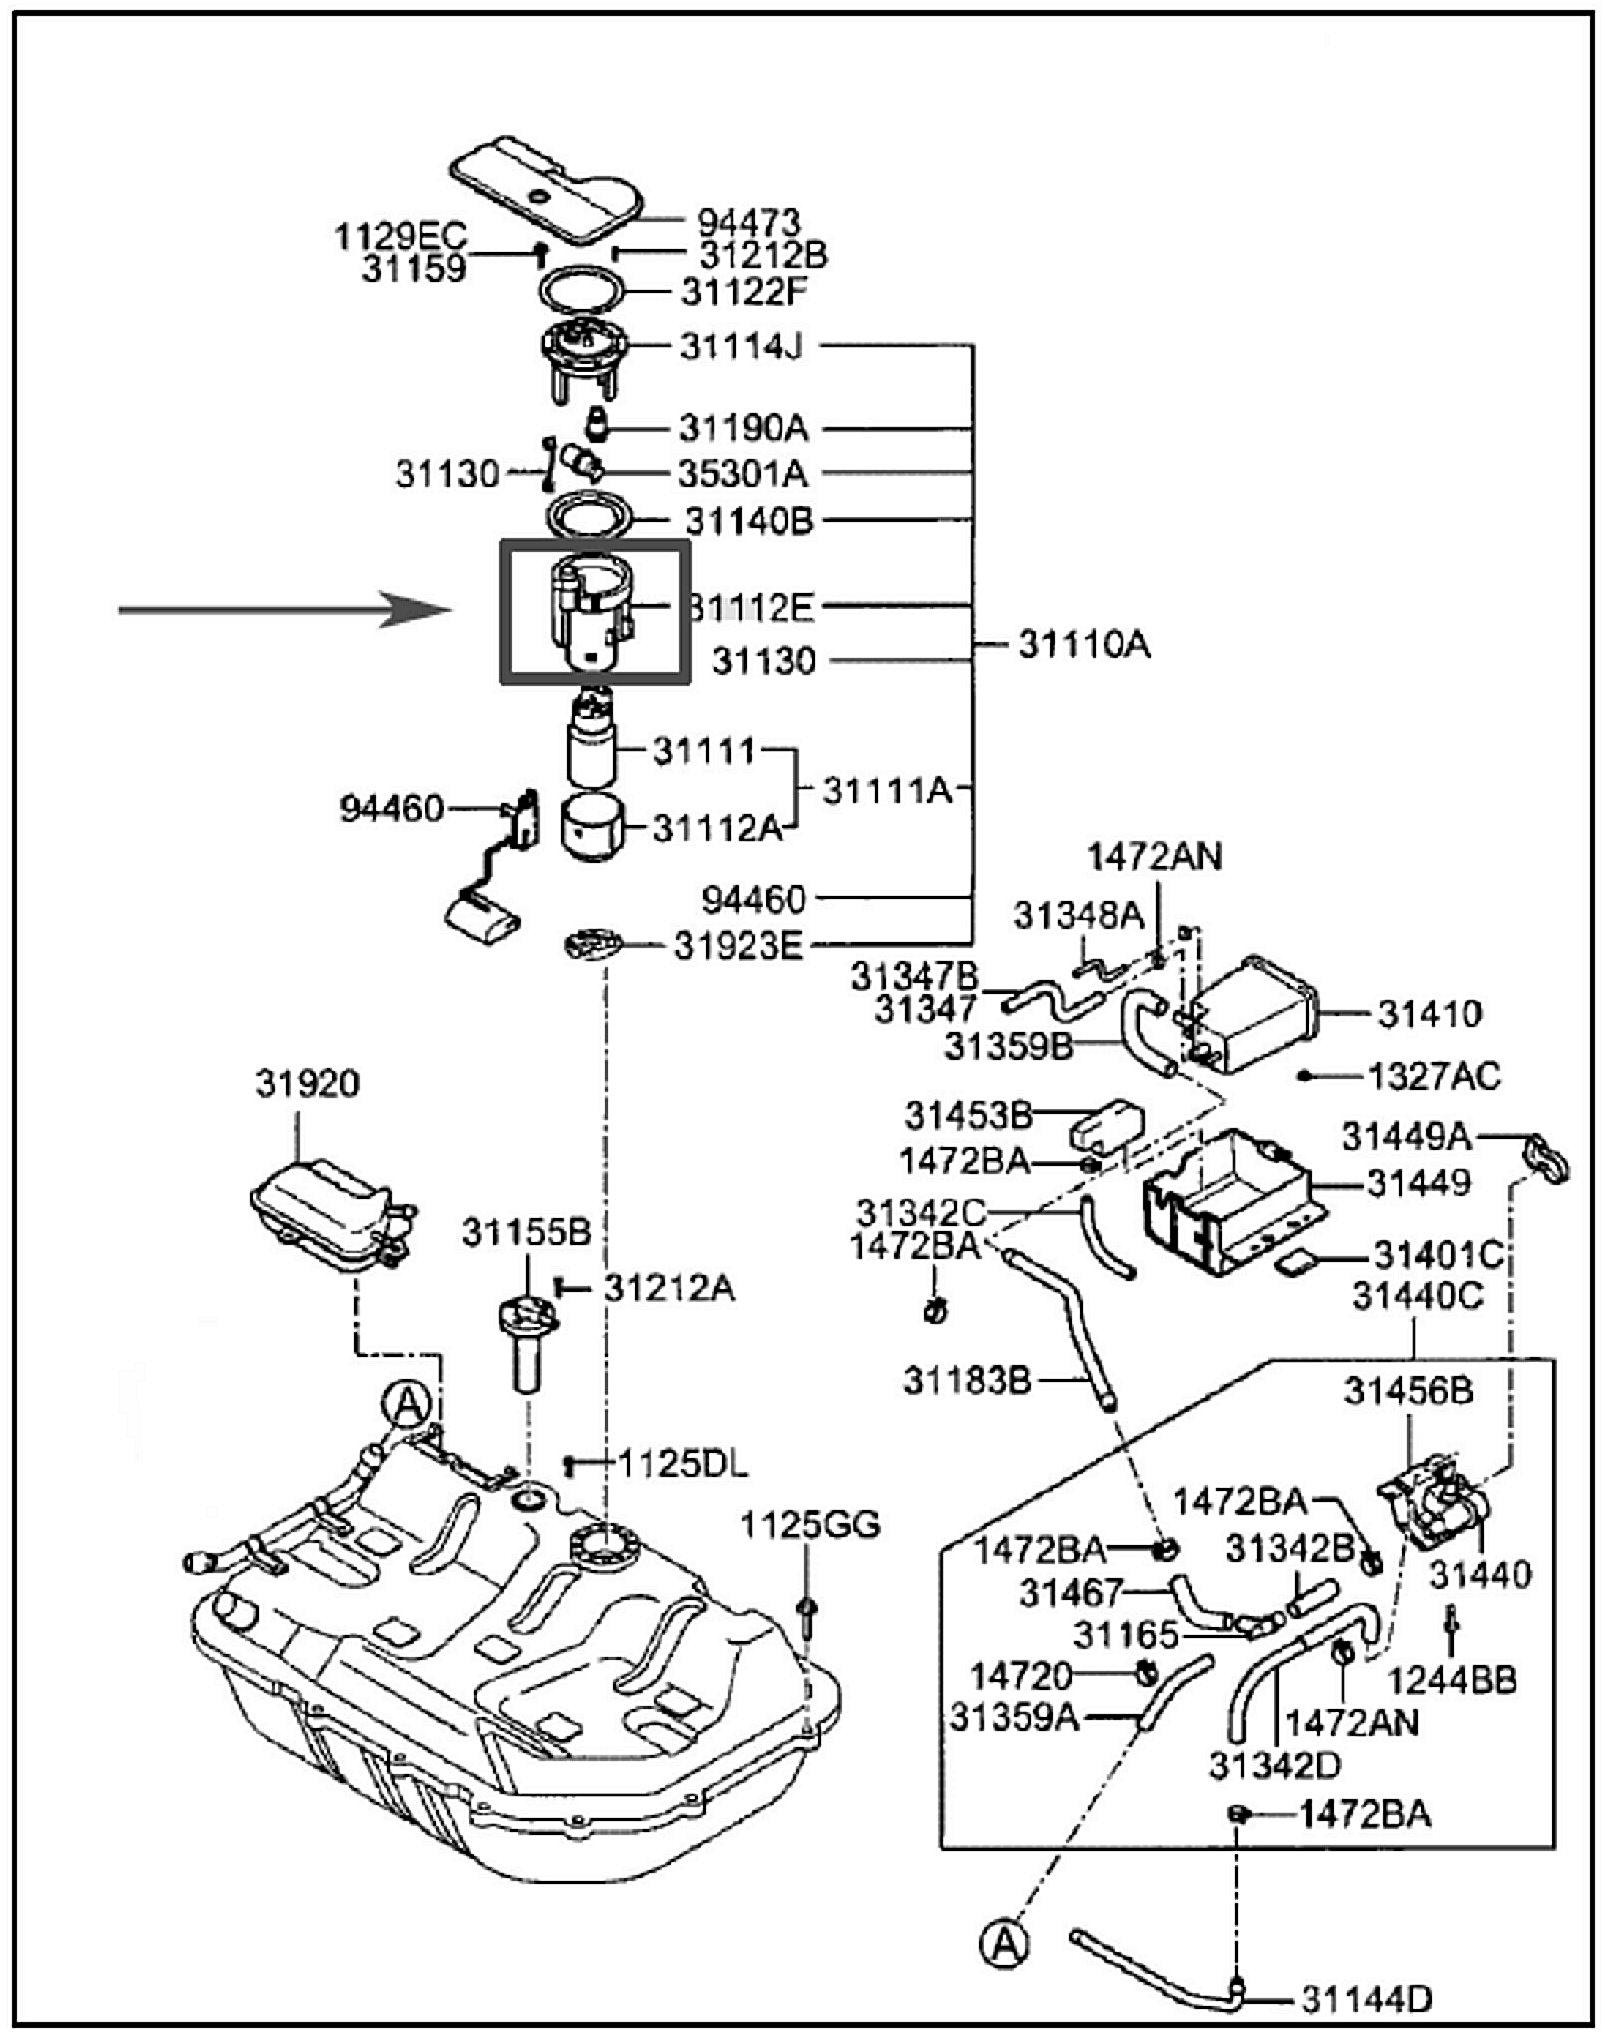 Nissan Altima Fuel Filter Location